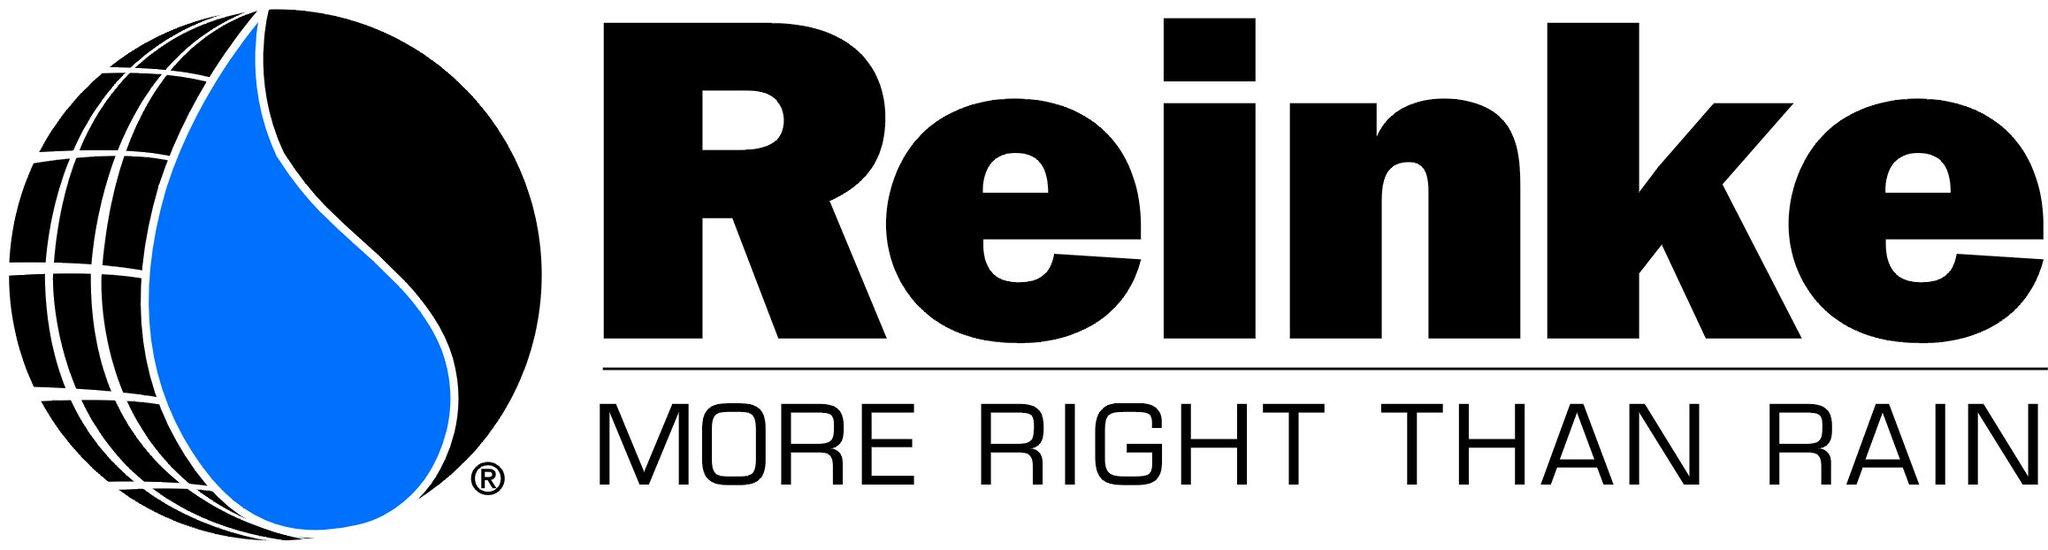 Personals in deshler nebraska Free Sex personals Housewives seeking real sex Peoria heights Illinois